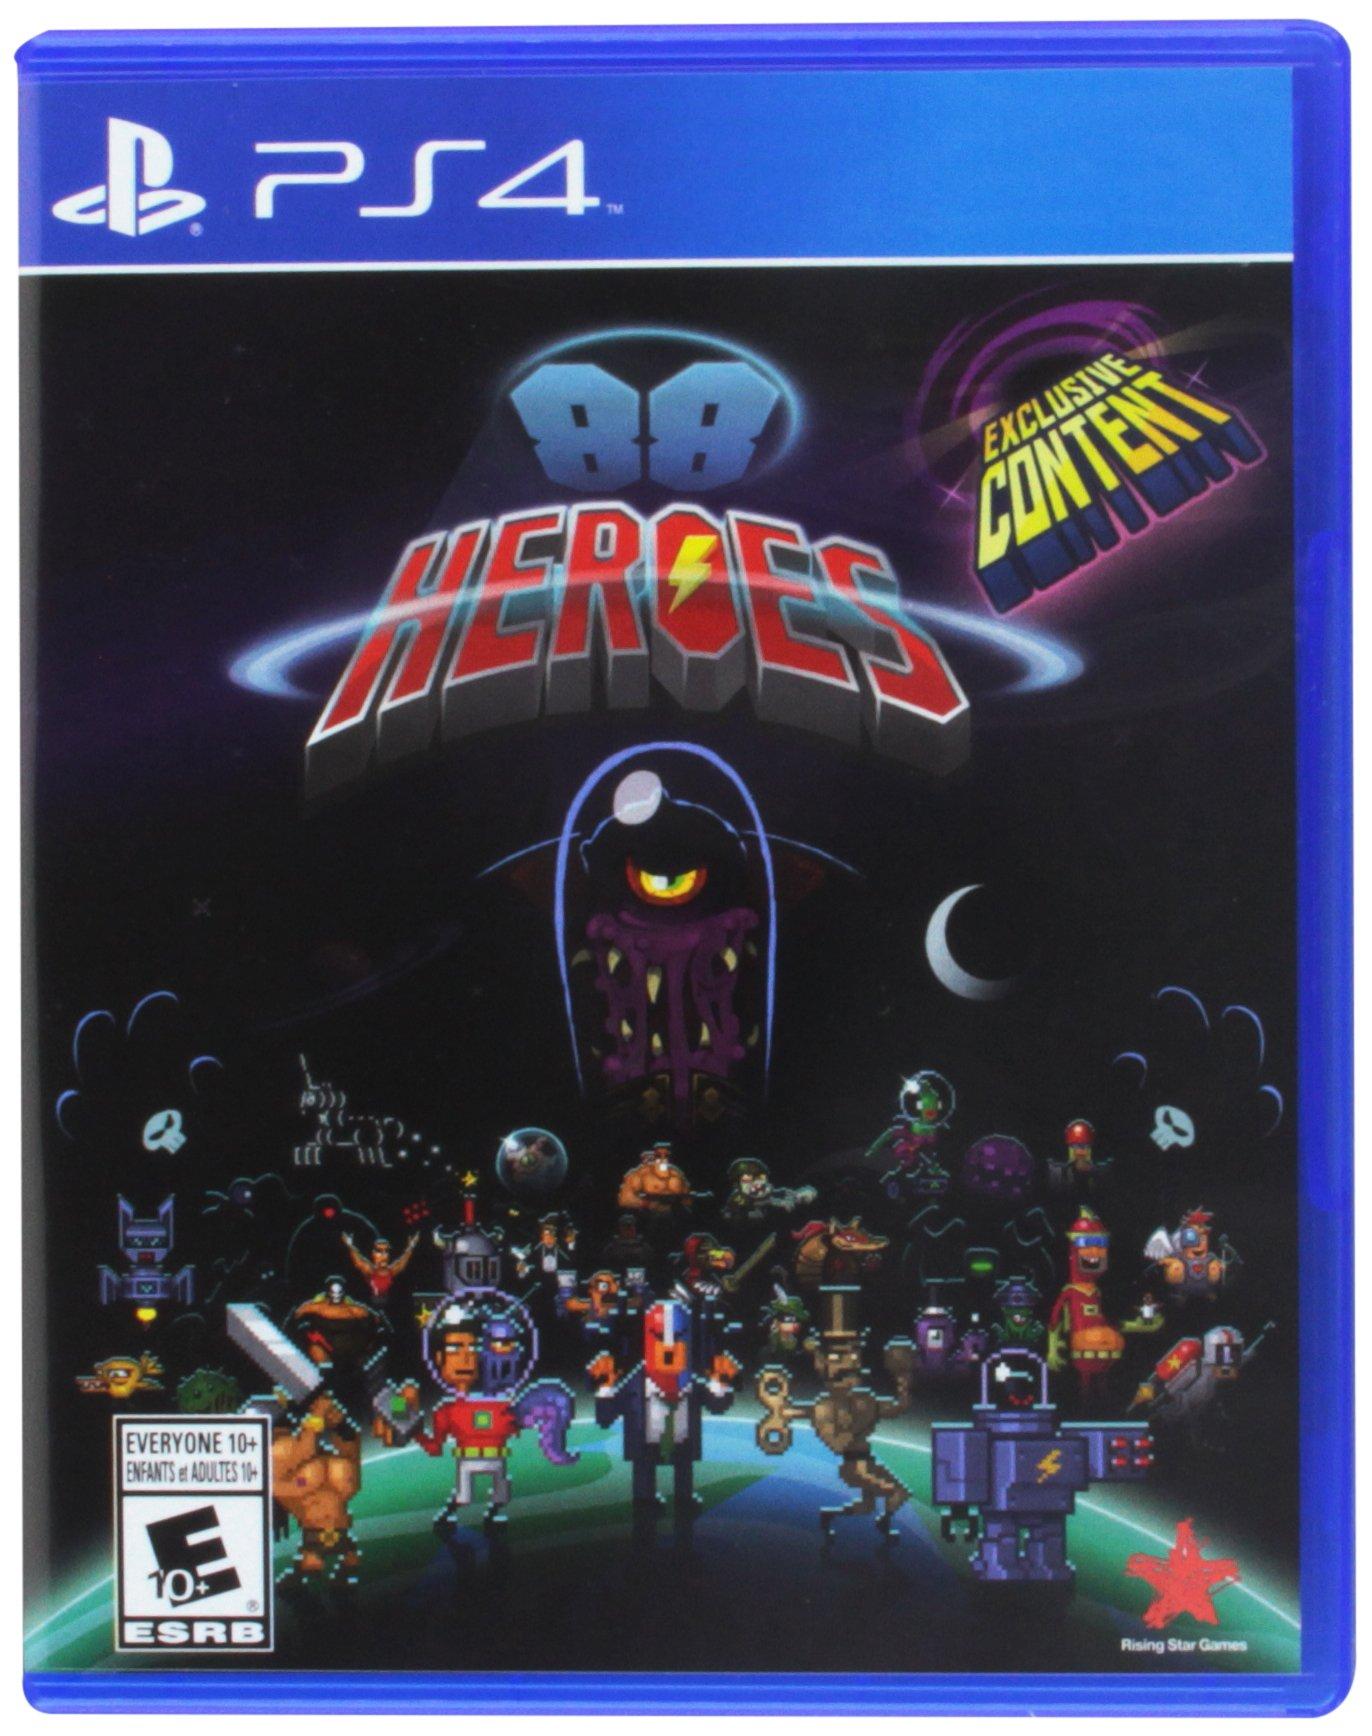 88 Heroes PS4 - PlayStation 4